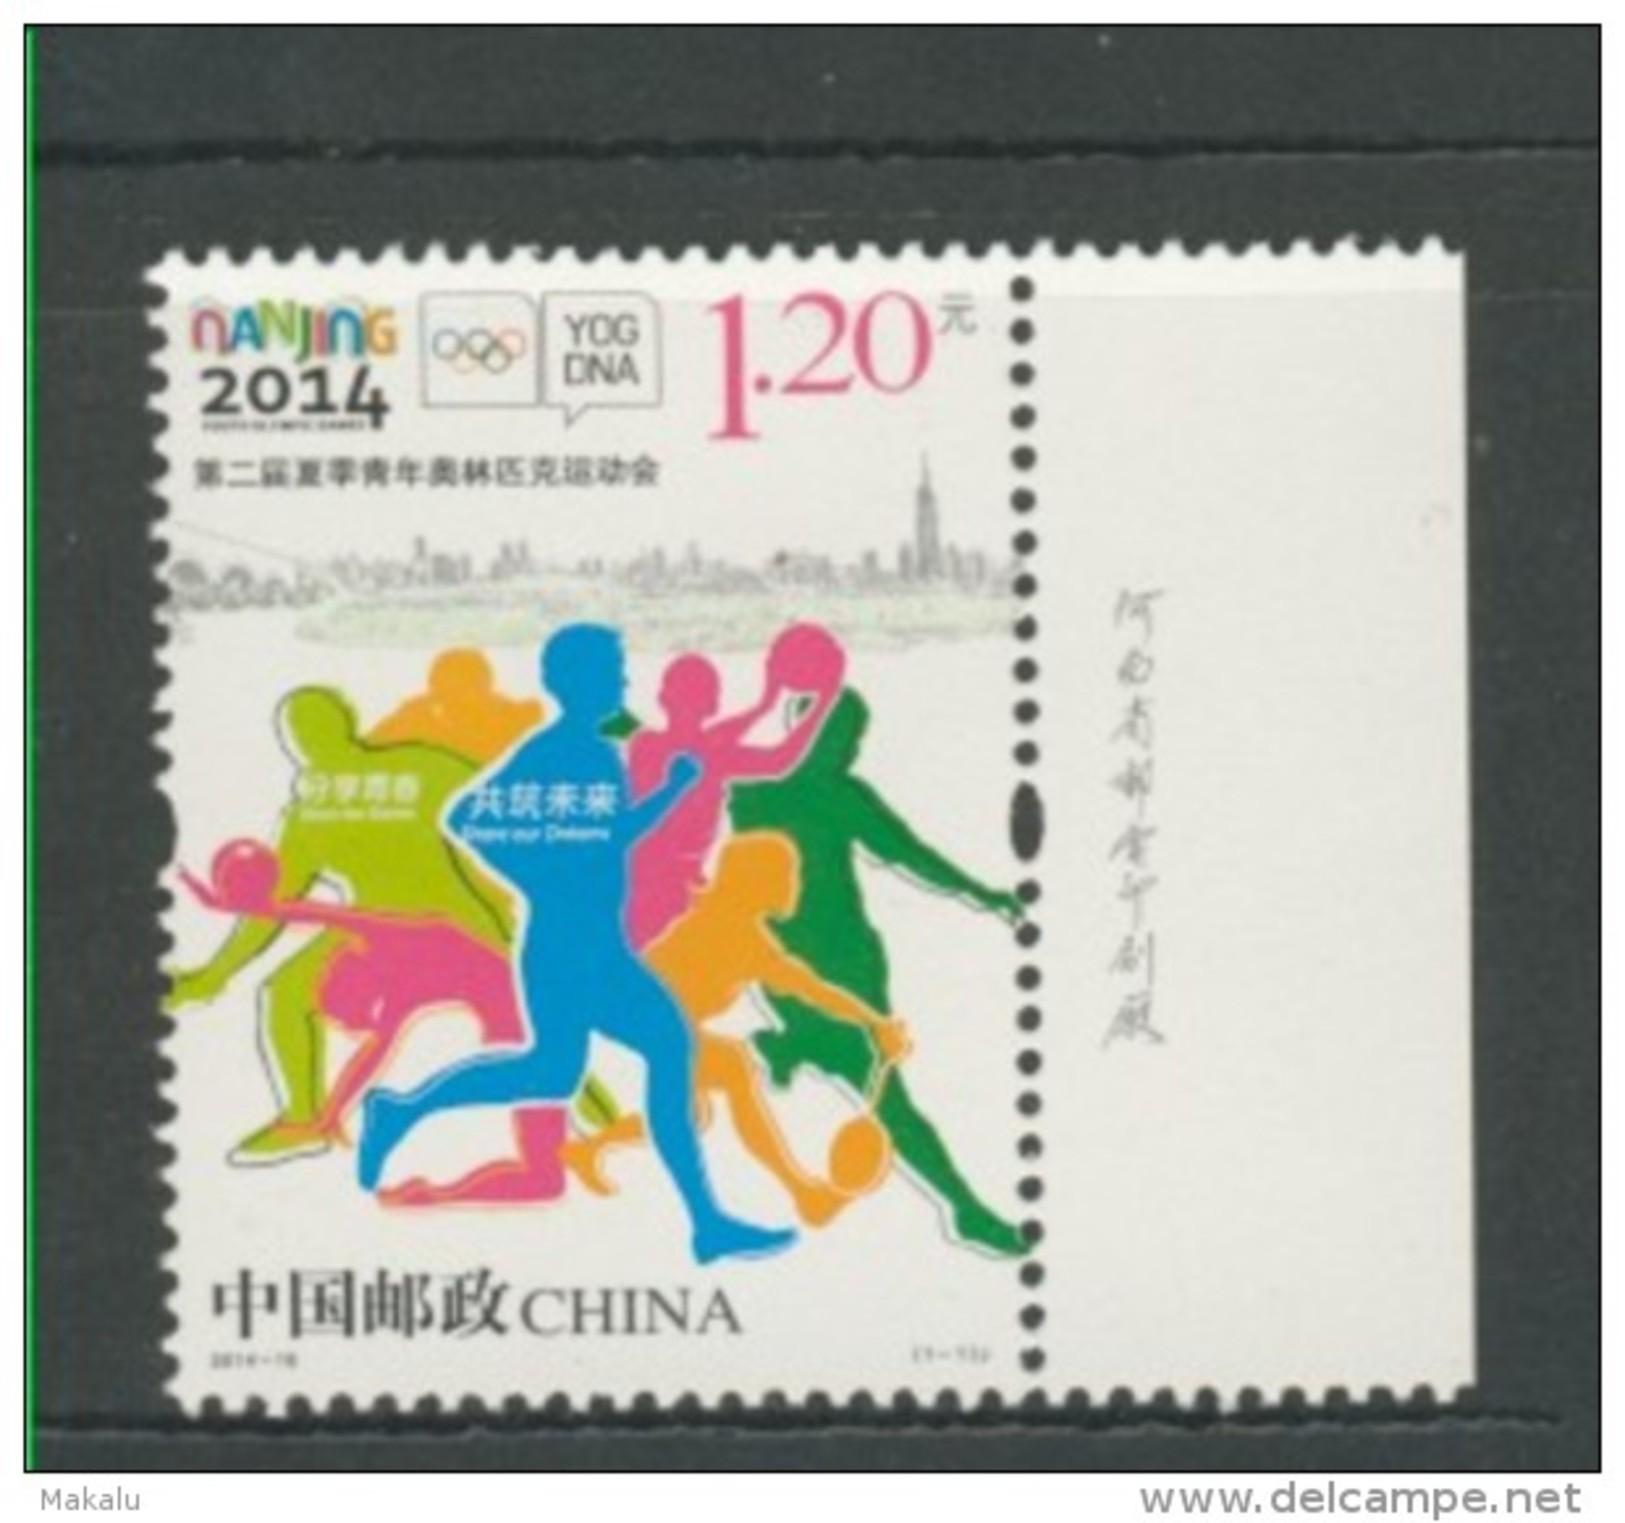 Chine Jo De La Jeunesse (5145) Tennis, Foot, Basket (?) - Summer 2014 : Nanjing (Youth Olympic Games)